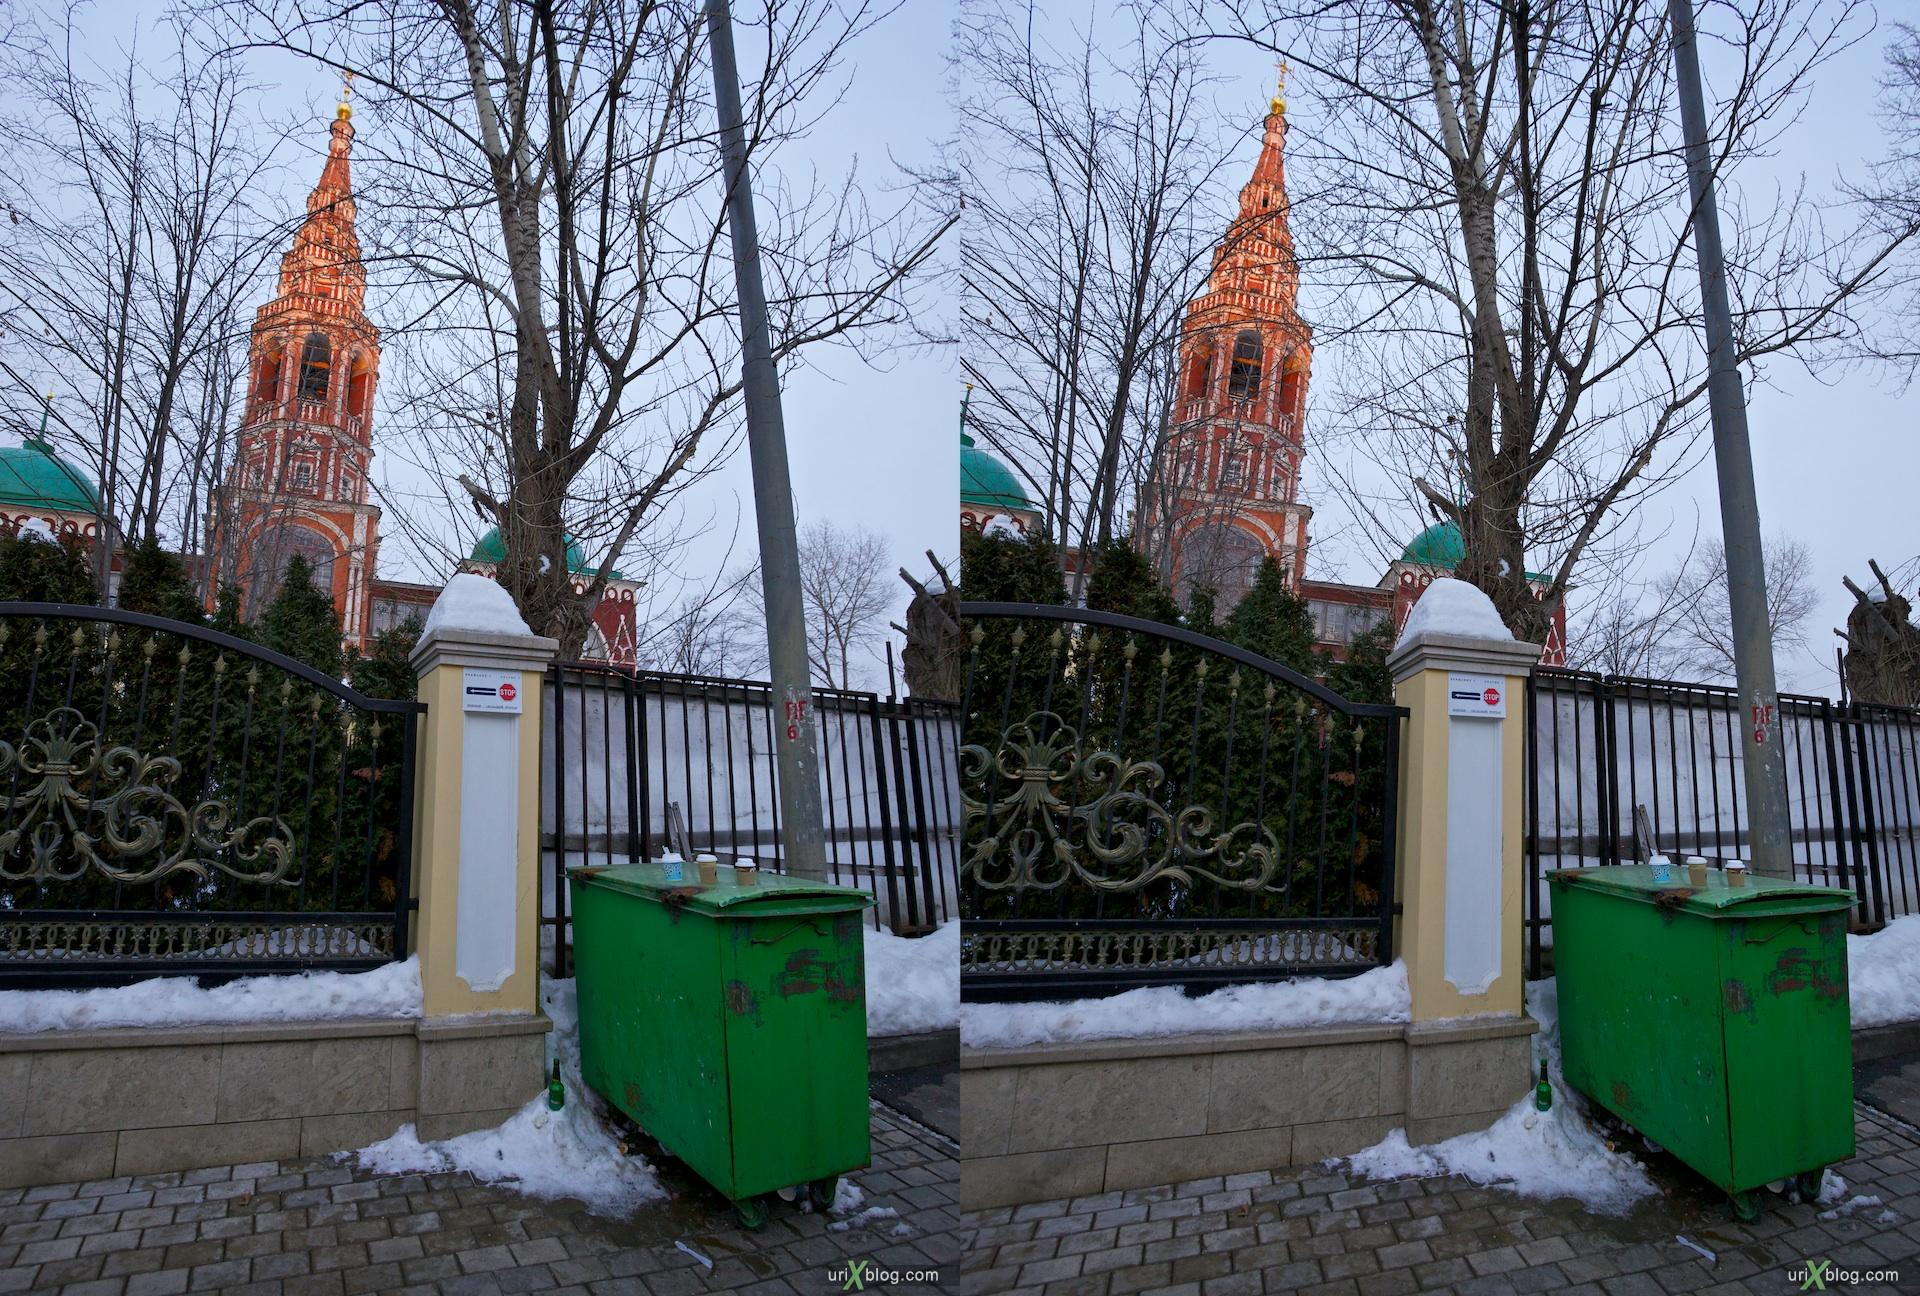 2011 церковь в Кадашах, храм в Кадашах, Kadashi Church, 3D, стерео, stereo